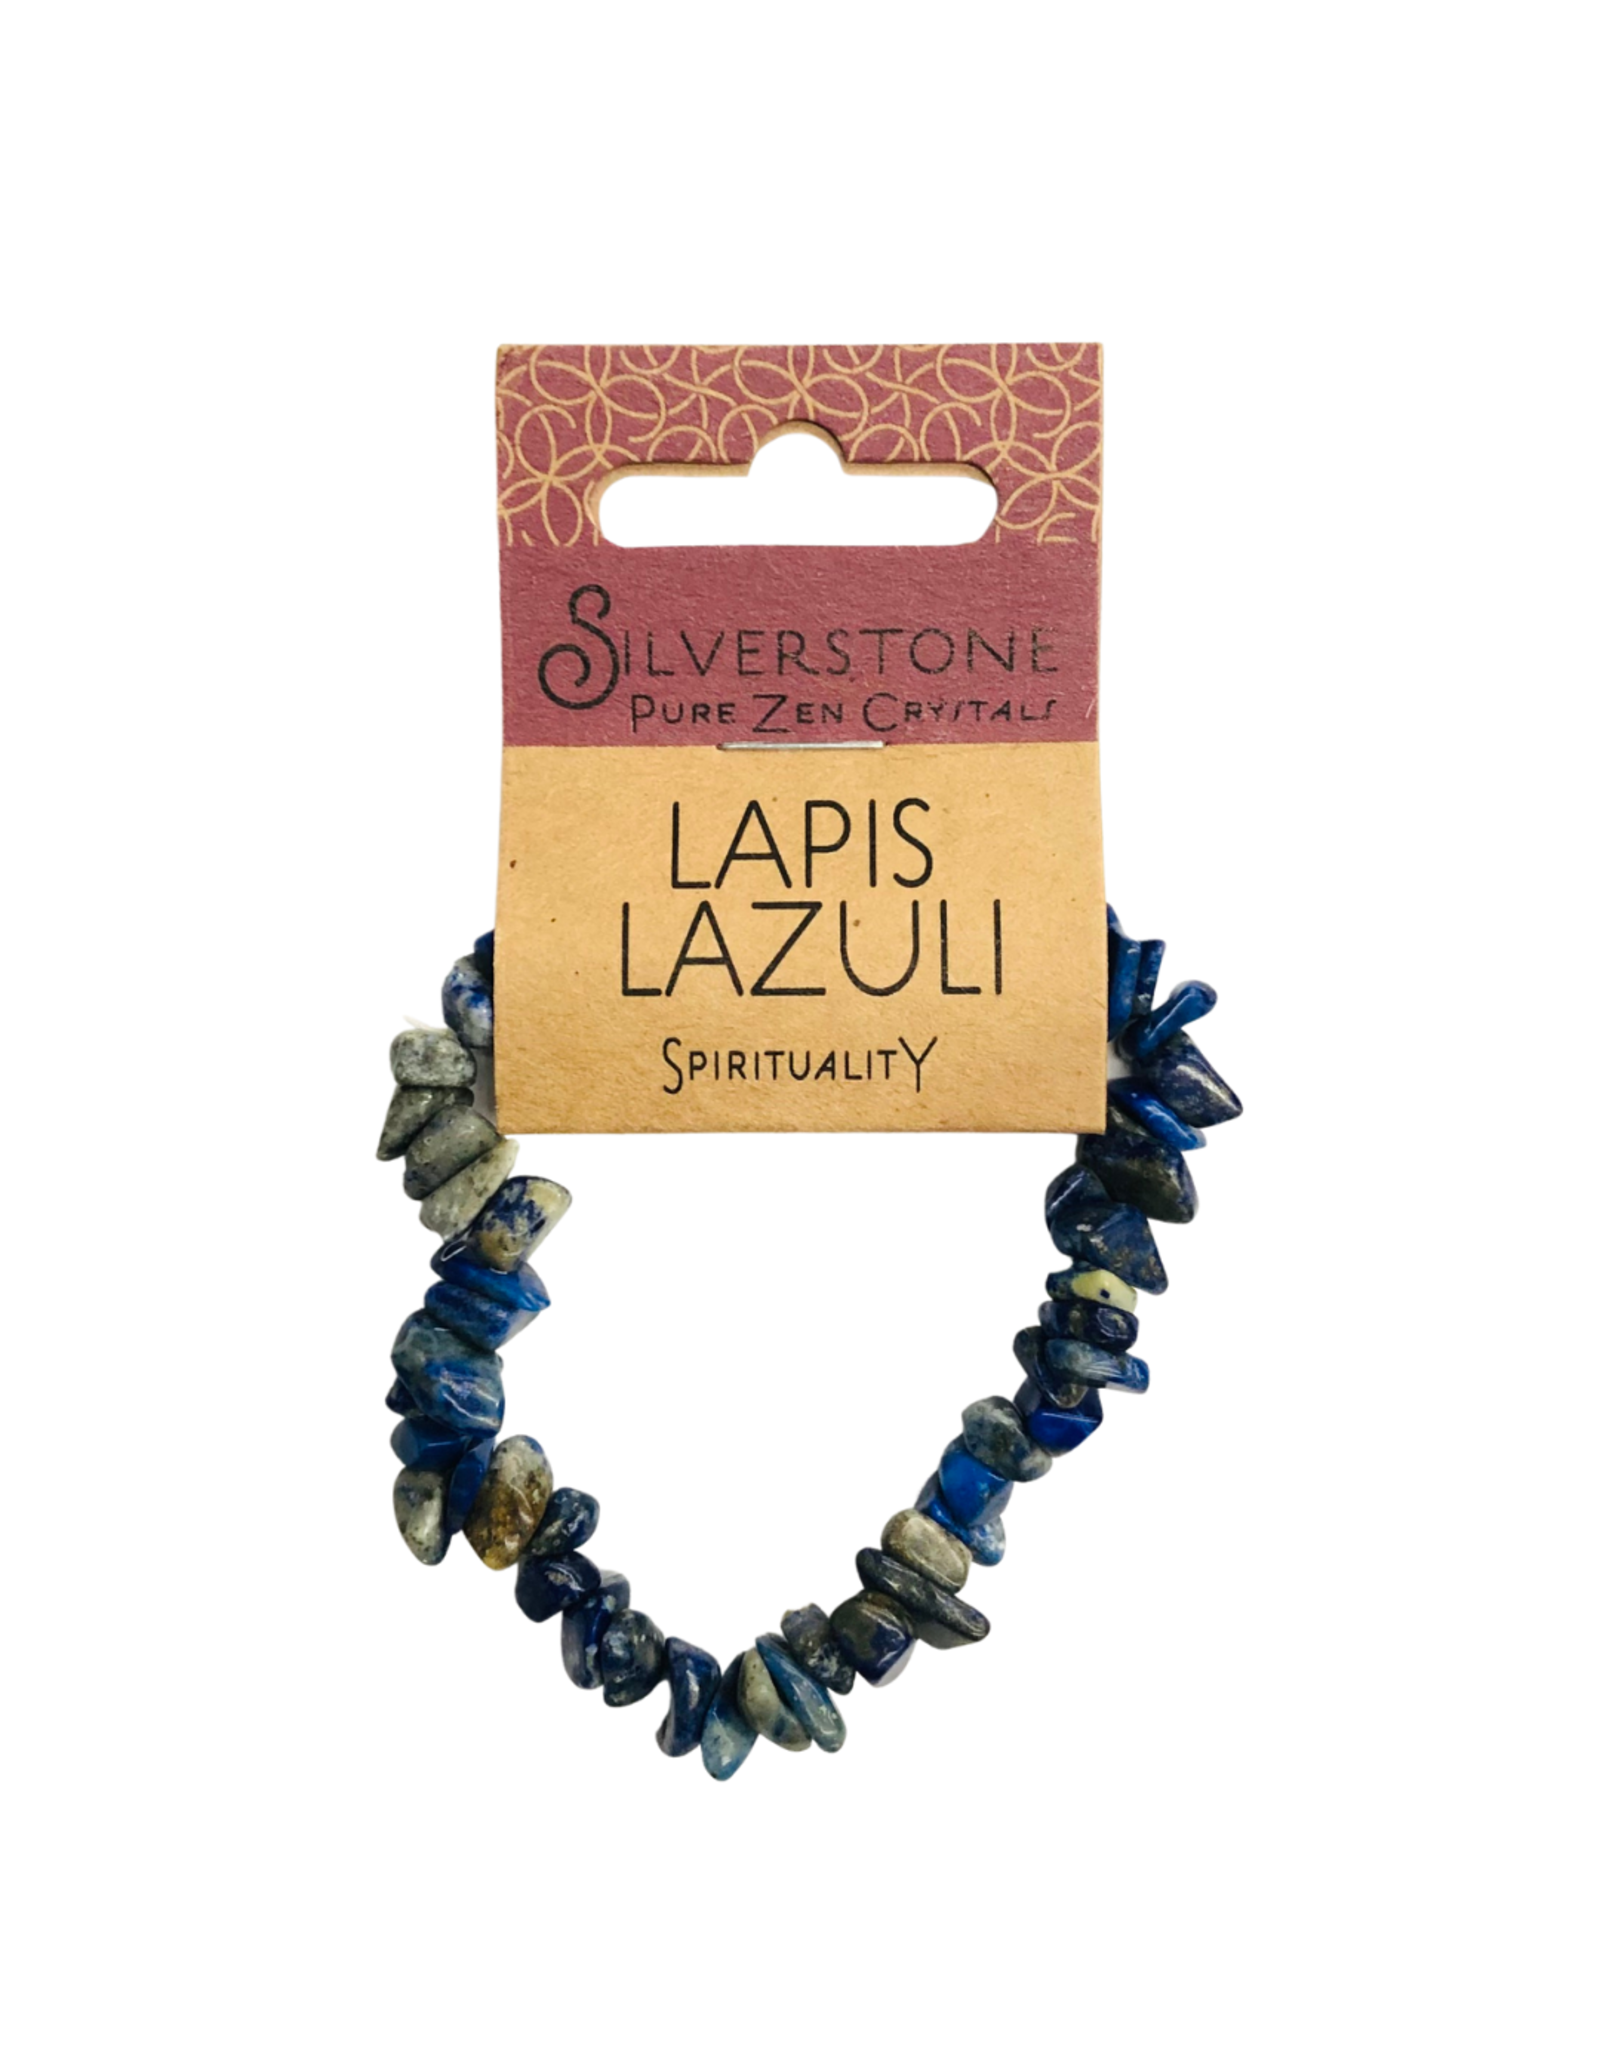 Silverstone Crystal Chip Bracelet - Lapis Lazuli - Eco Range